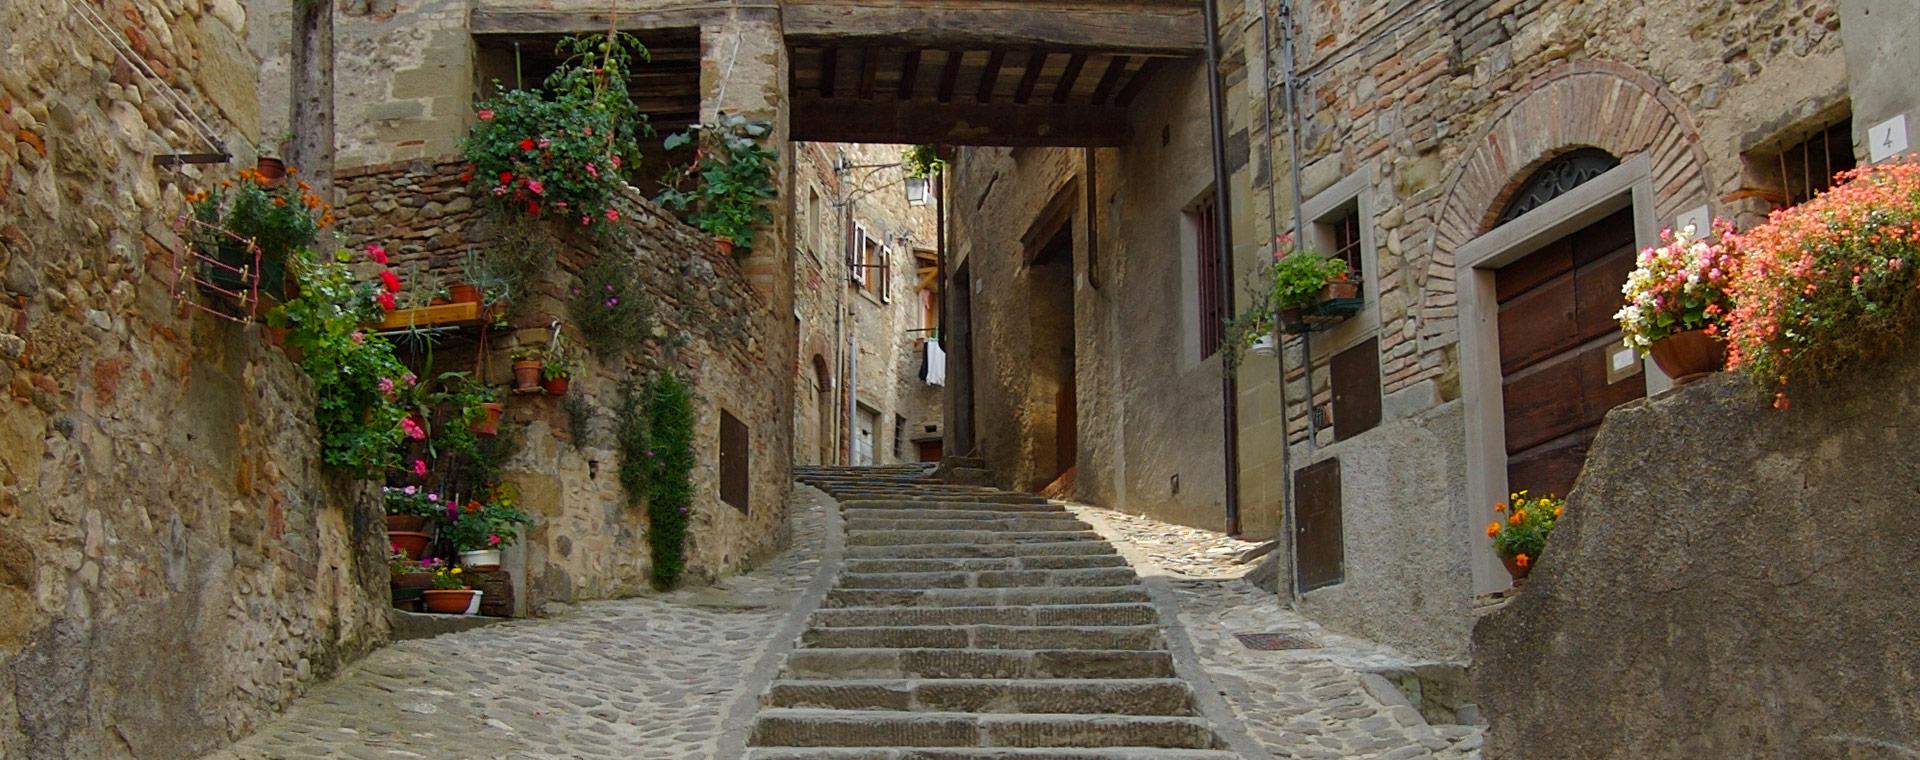 Villa nella campagna Toscana a Sansepolcro